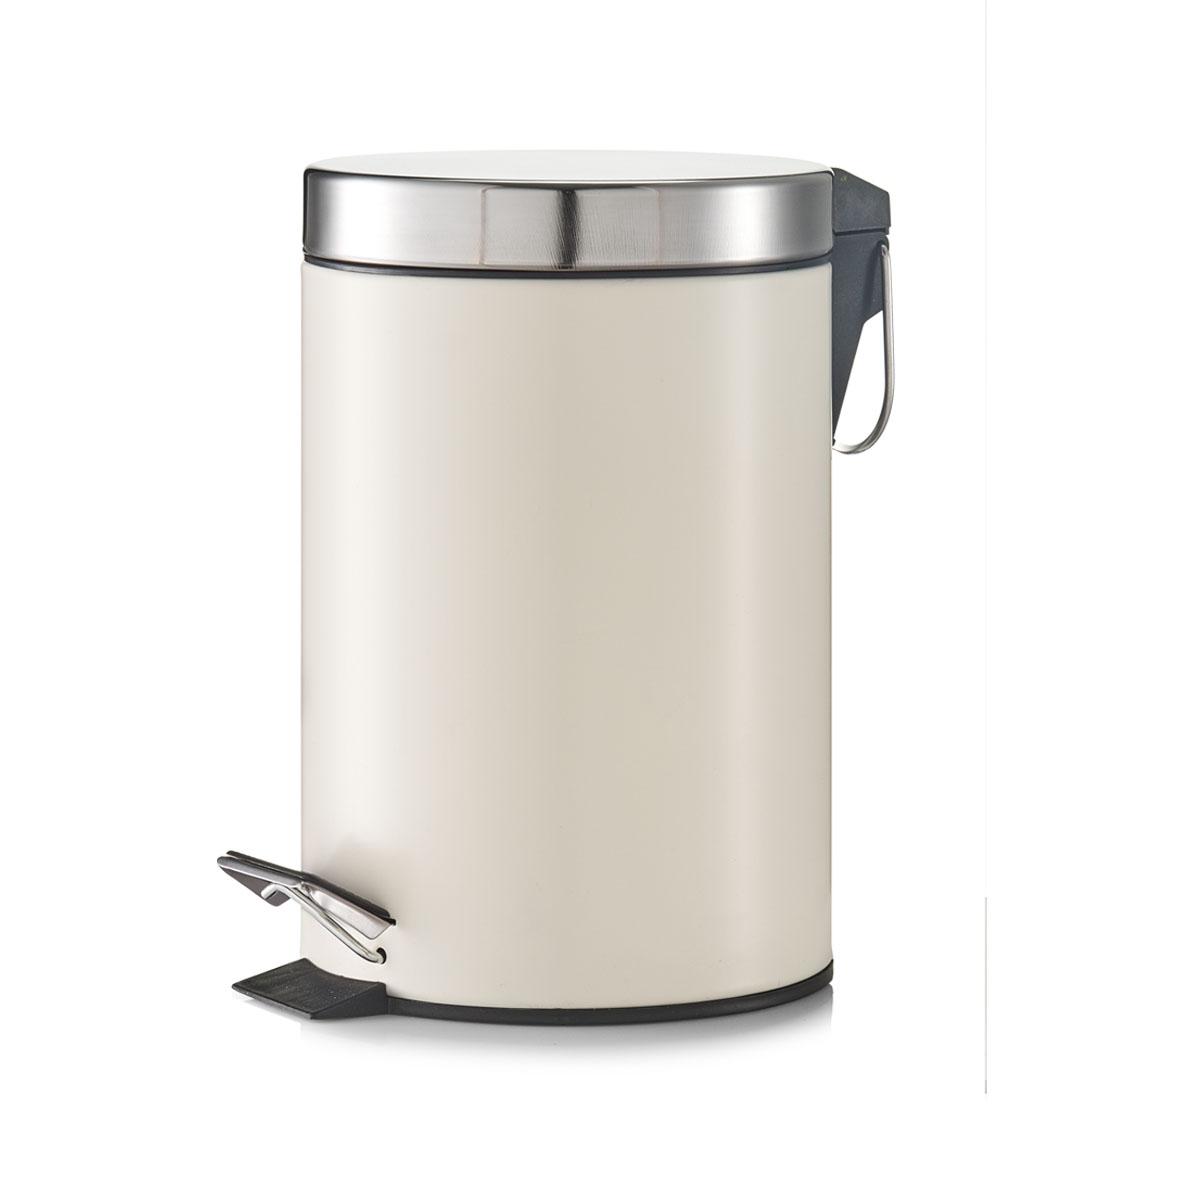 Cos de gunoi cu pedala pentru baie, Metal, Capac argintiu, 3L somproduct.ro